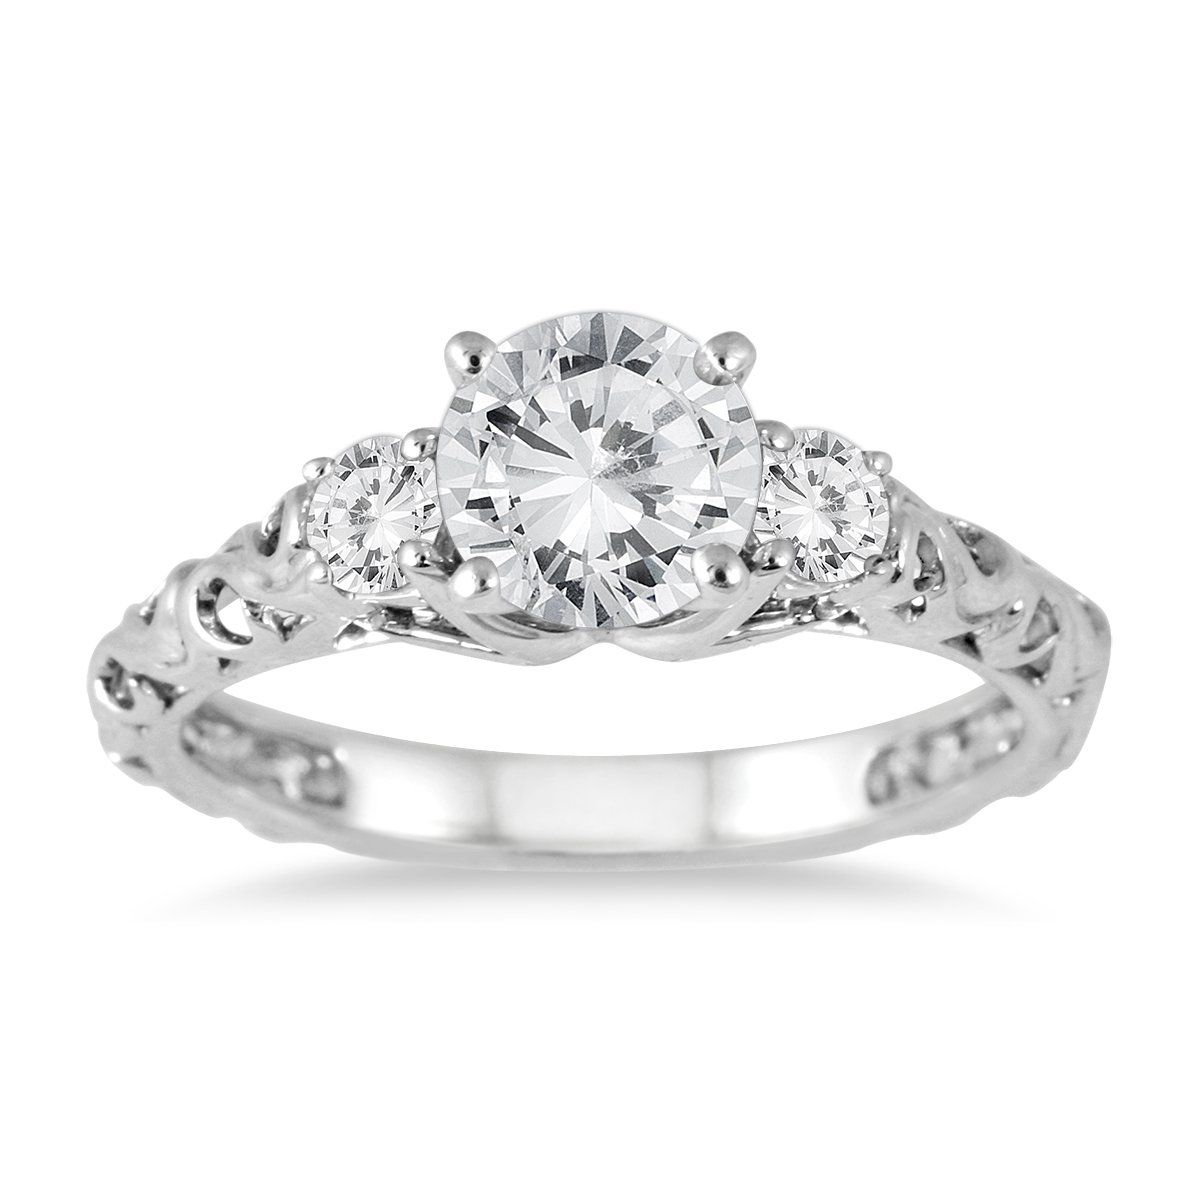 1 Carat Diamond Three Stone Art Deco Ring in 14K White Gold